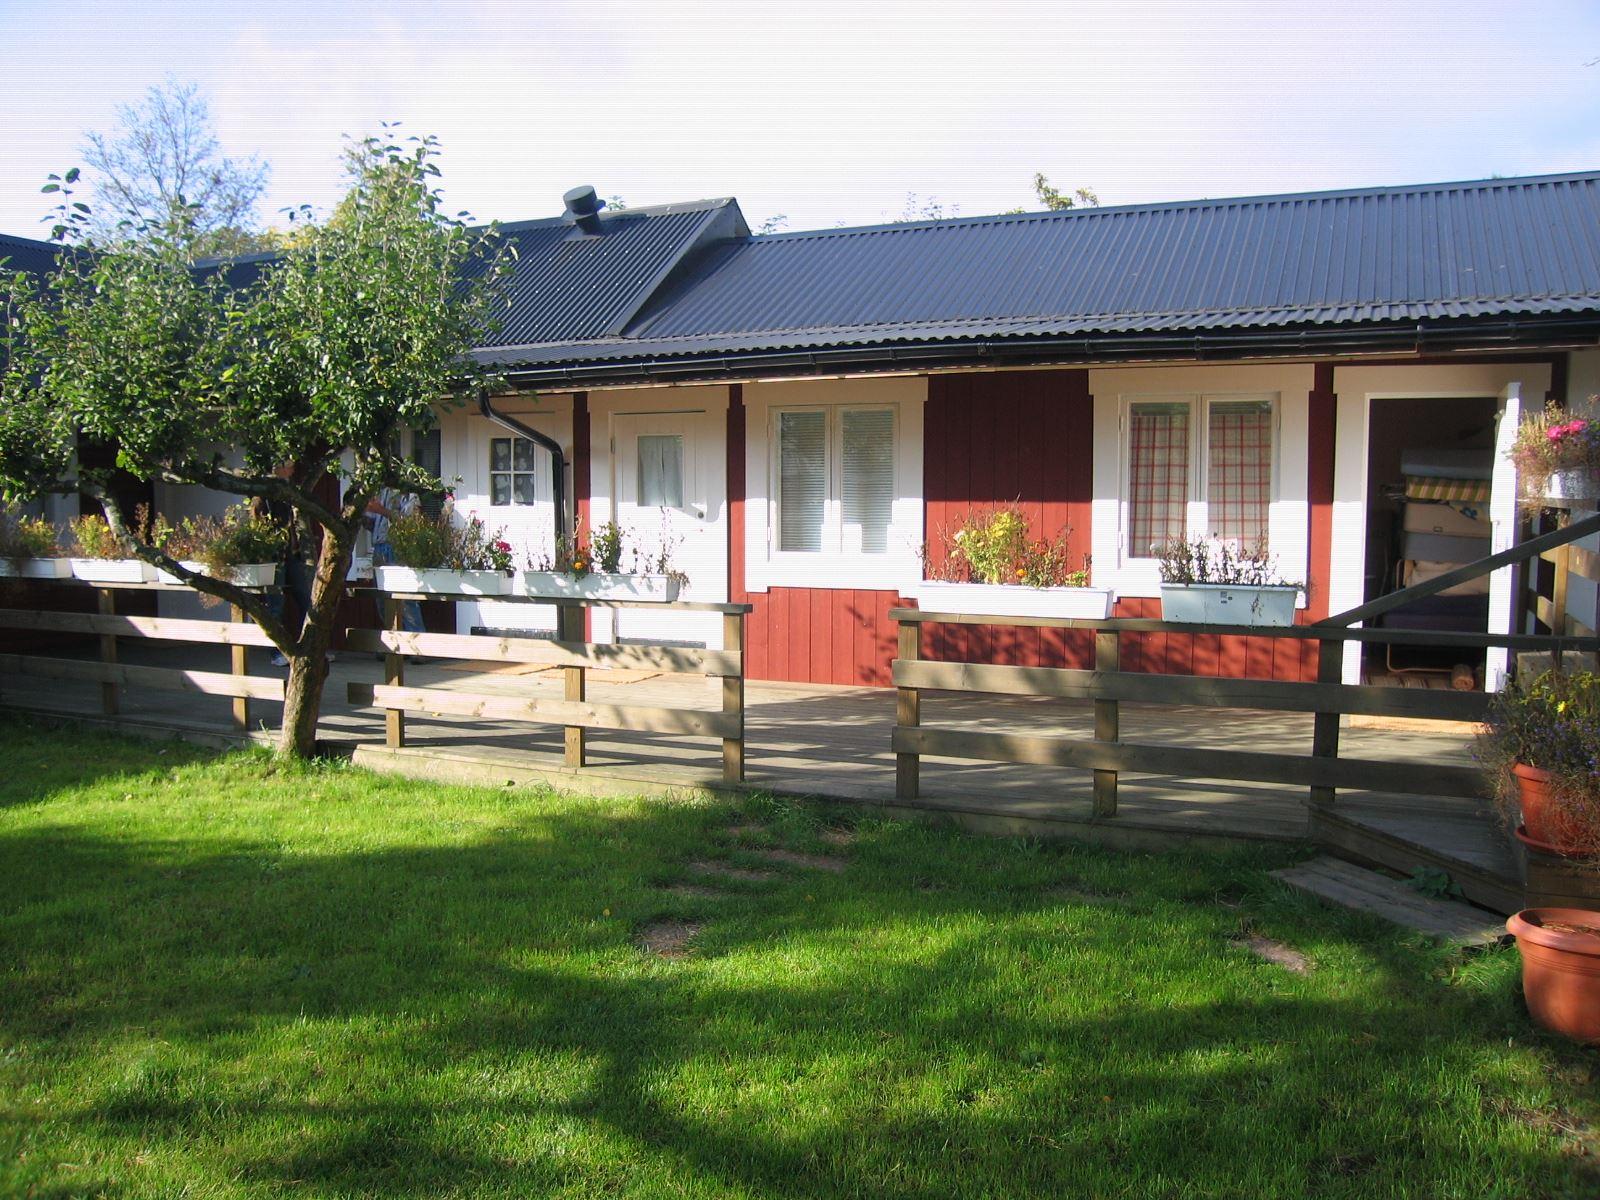 R5506 Privatzimmer Köpmangatan 28